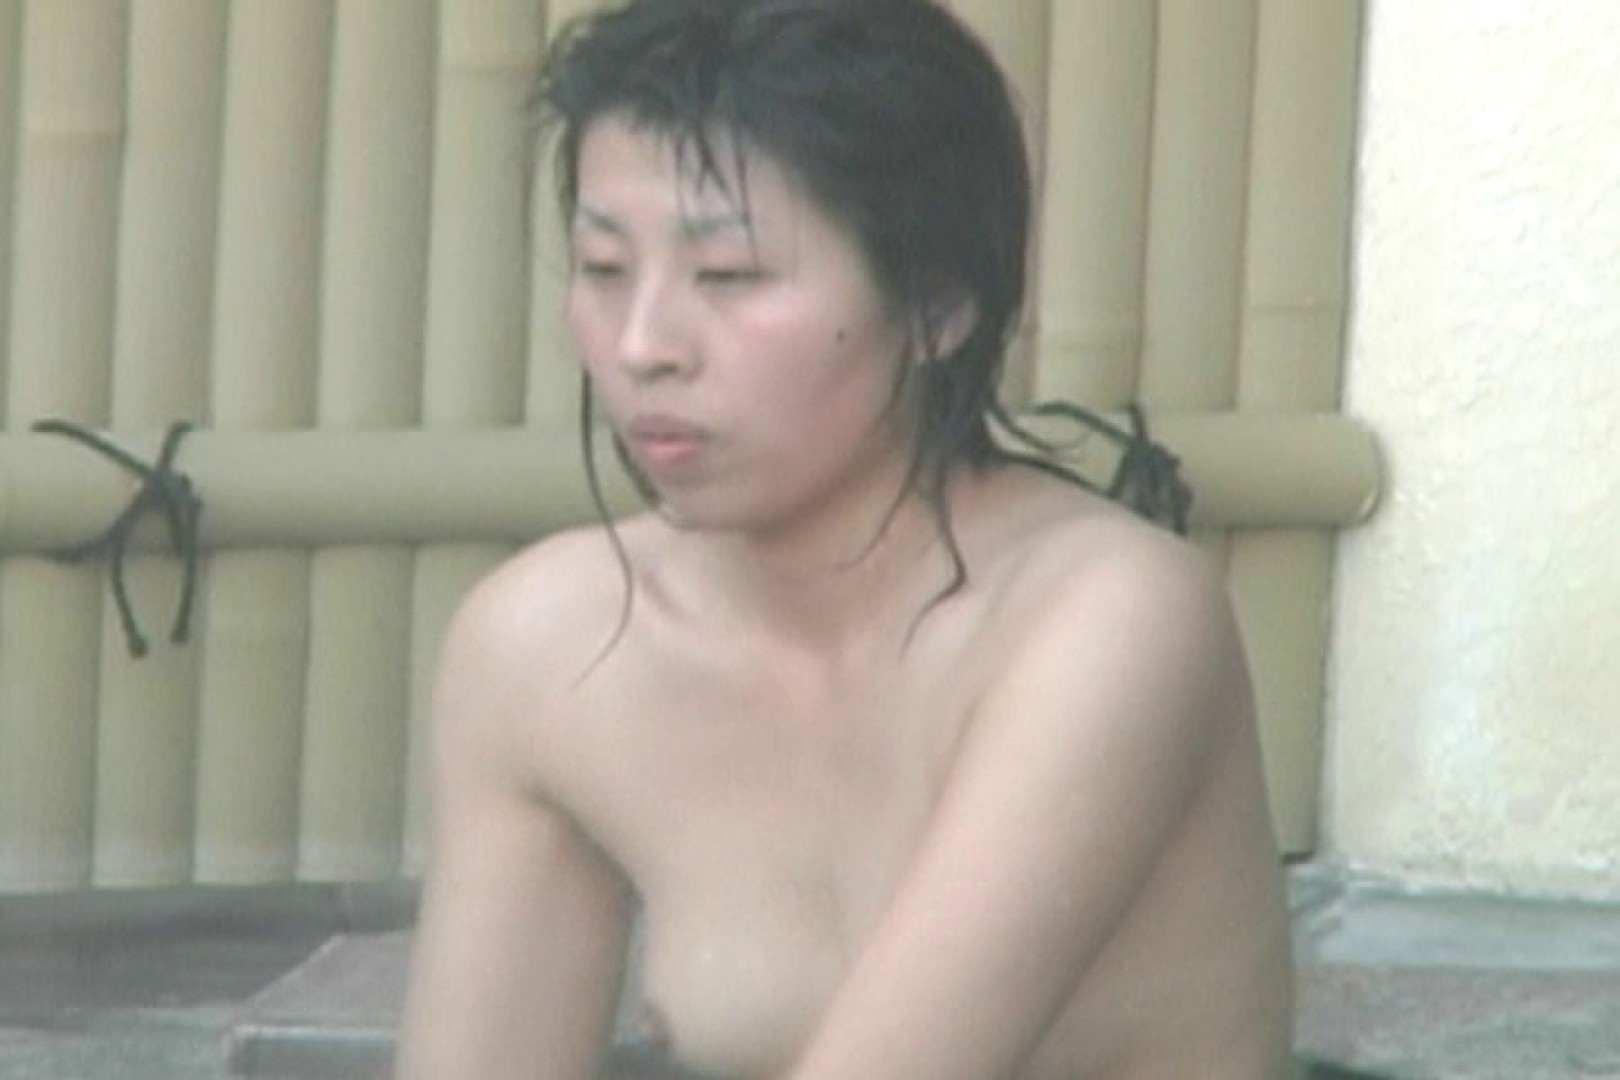 Aquaな露天風呂Vol.589 盗撮シリーズ | 露天風呂編  113PIX 85